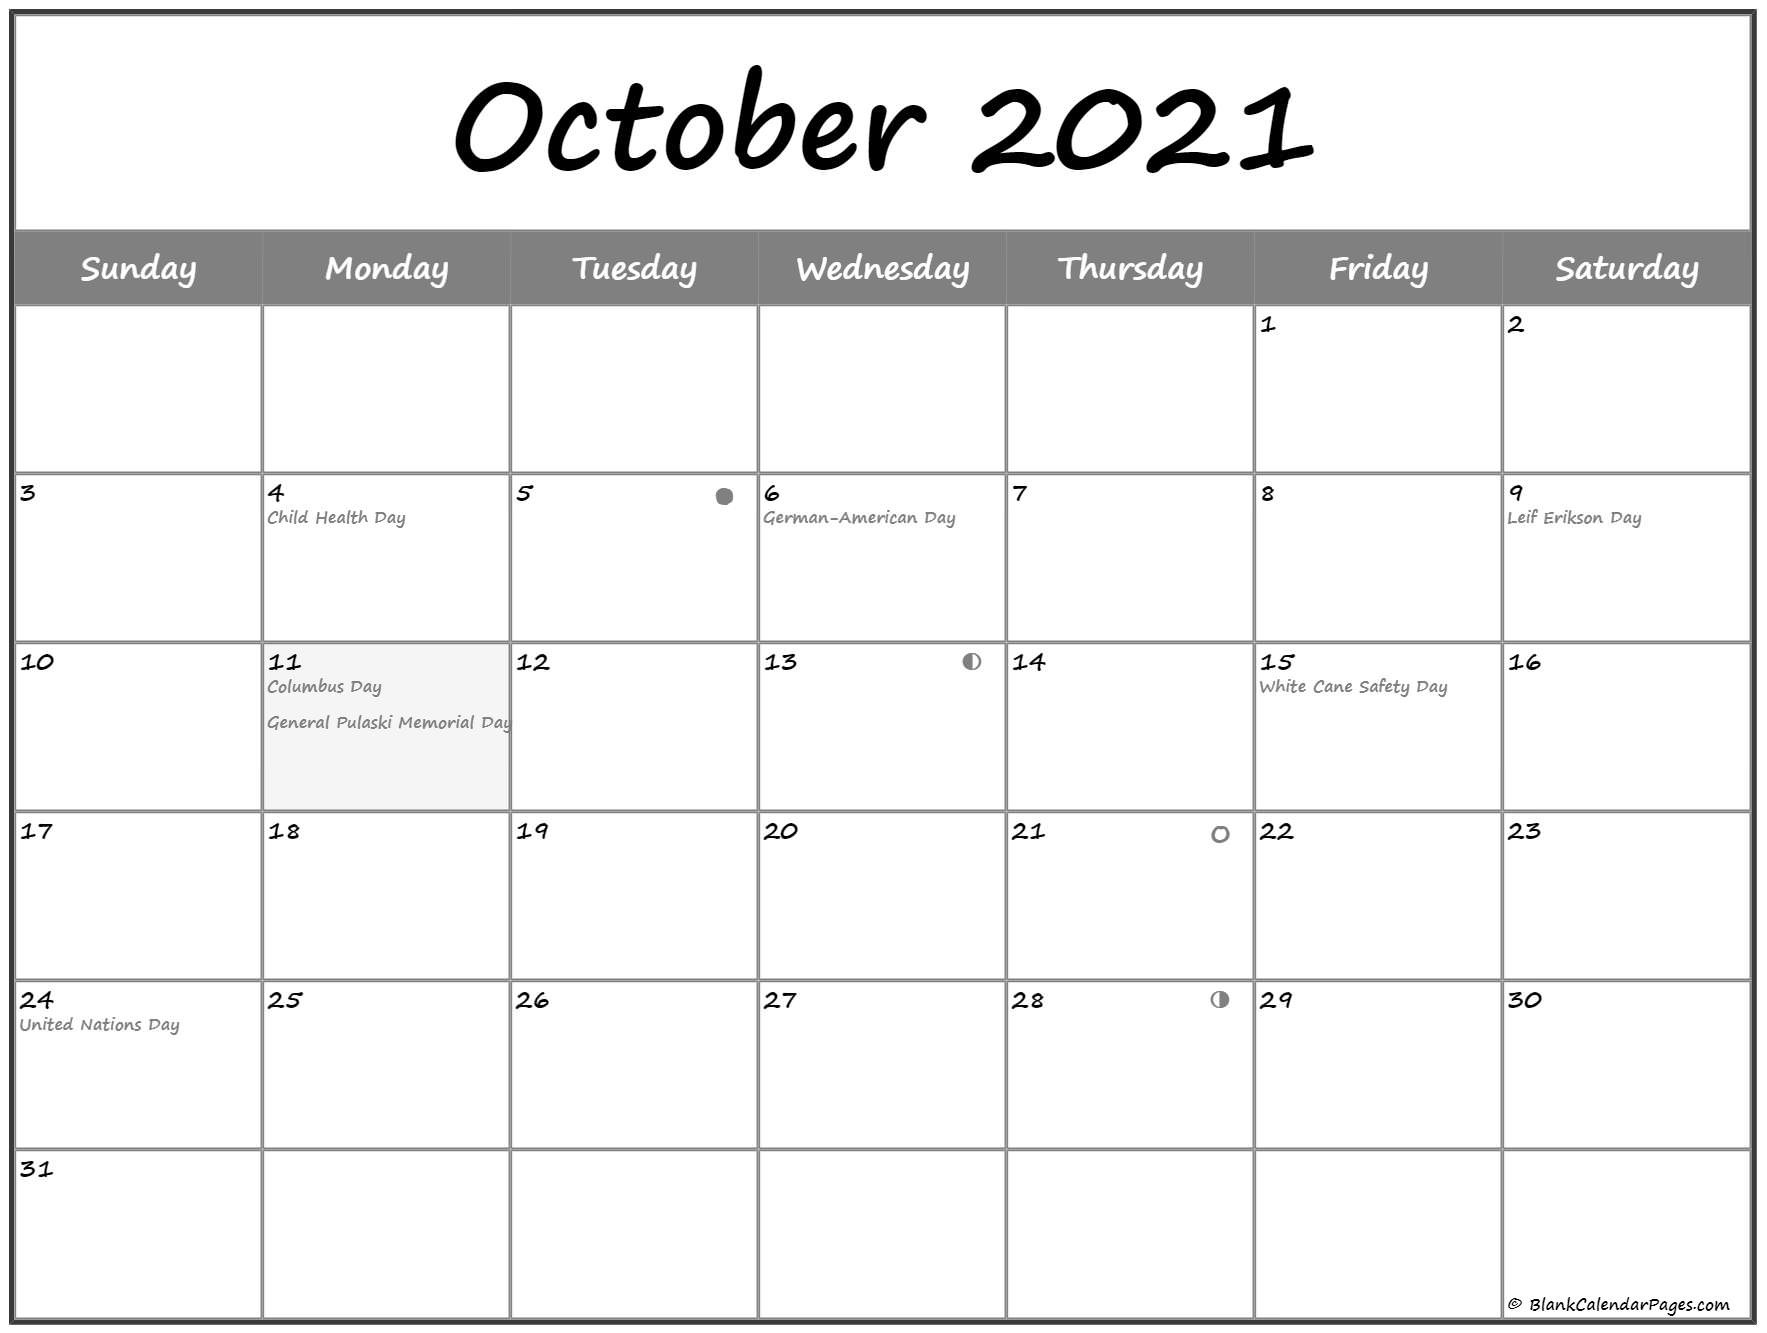 October 2021 Lunar Calendar | Moon Phase Calendar-2021 4 Shift Calendar